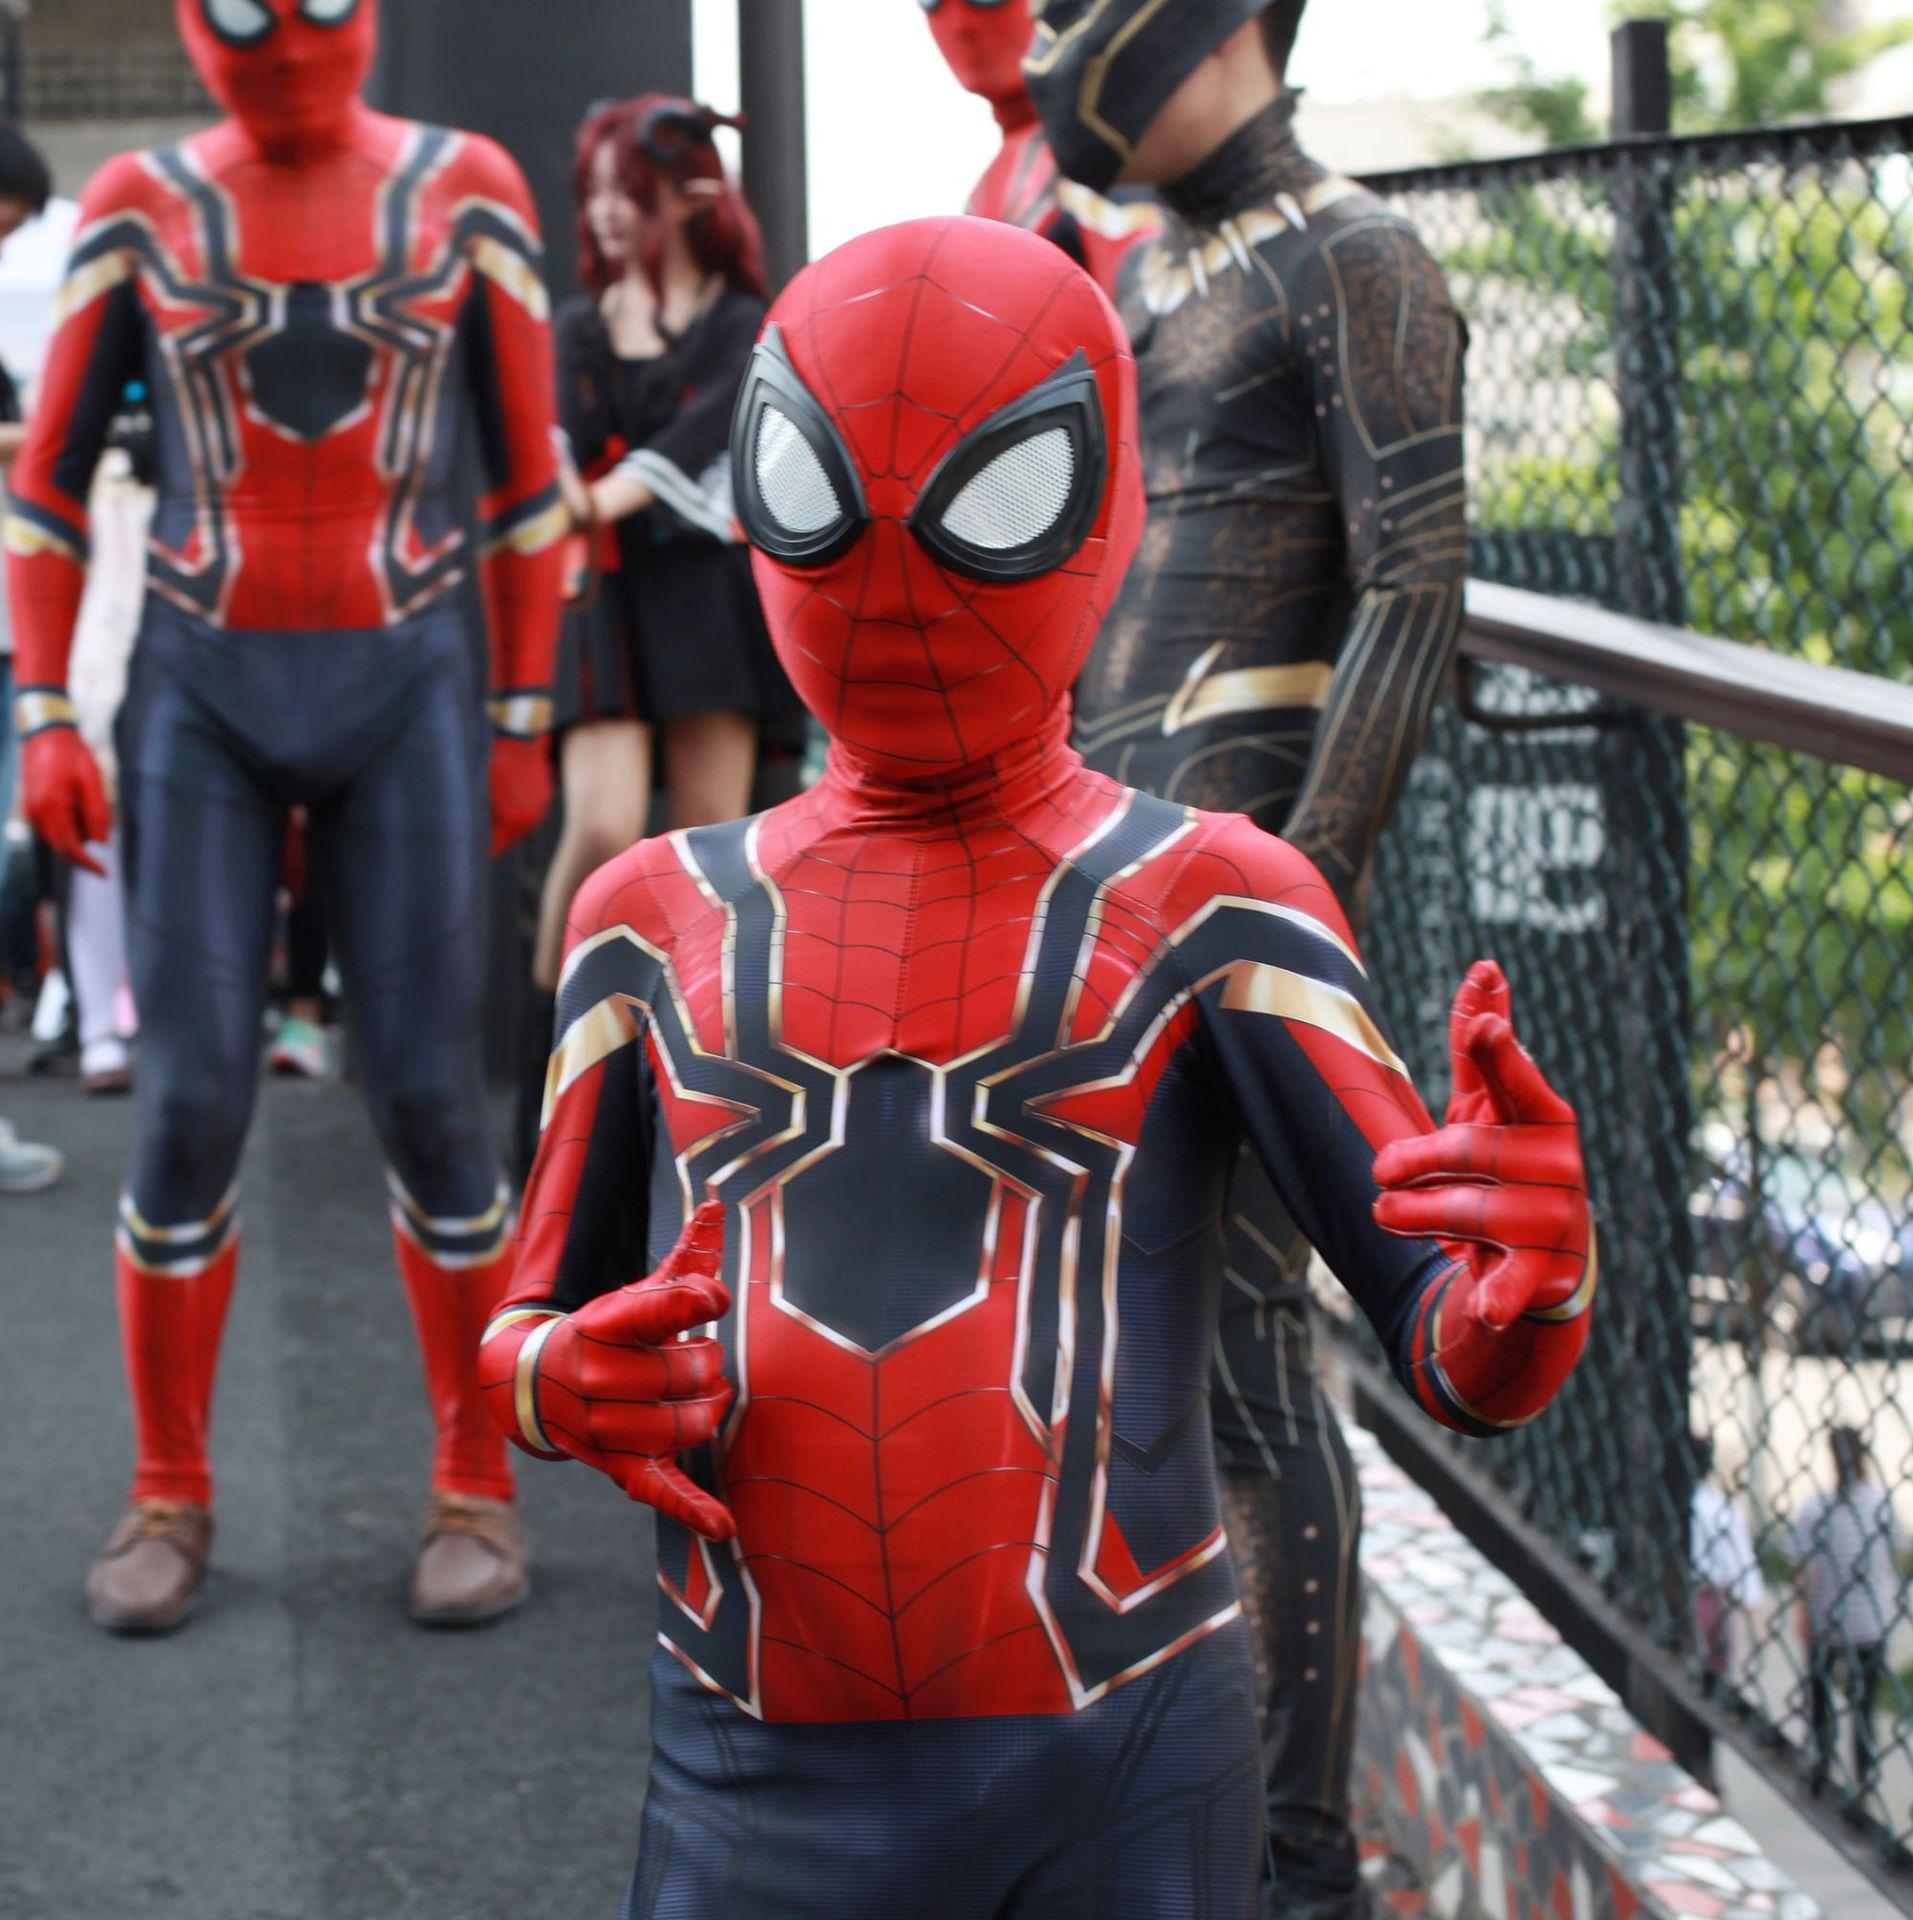 Boys Spiderman Homecoming Cosplay Costume Superhero Avengers 3 Zentai Iron Spider Man Bodysuit Kids Halloween Spandex Jumpsuit